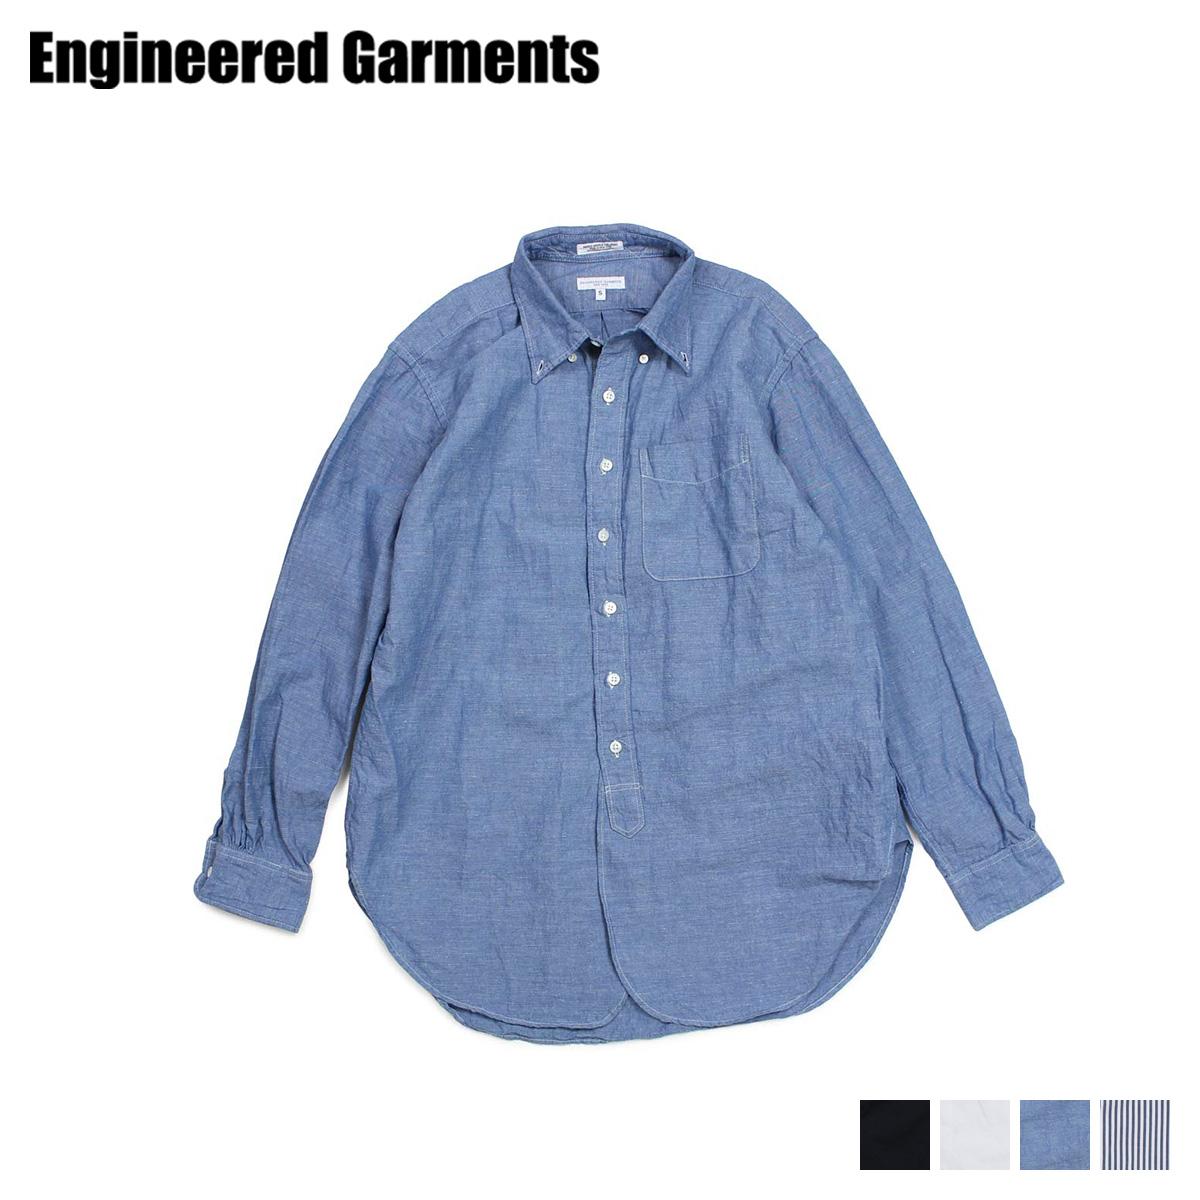 ENGINEERED GARMENTS 19 CENTURY BUTTON DOWN SHIRT エンジニアドガーメンツ シャツ 長袖 オックスフォードシャツ メンズ ブラック ホワイト ブルー 黒 白 19SA001 [3/28 新入荷]